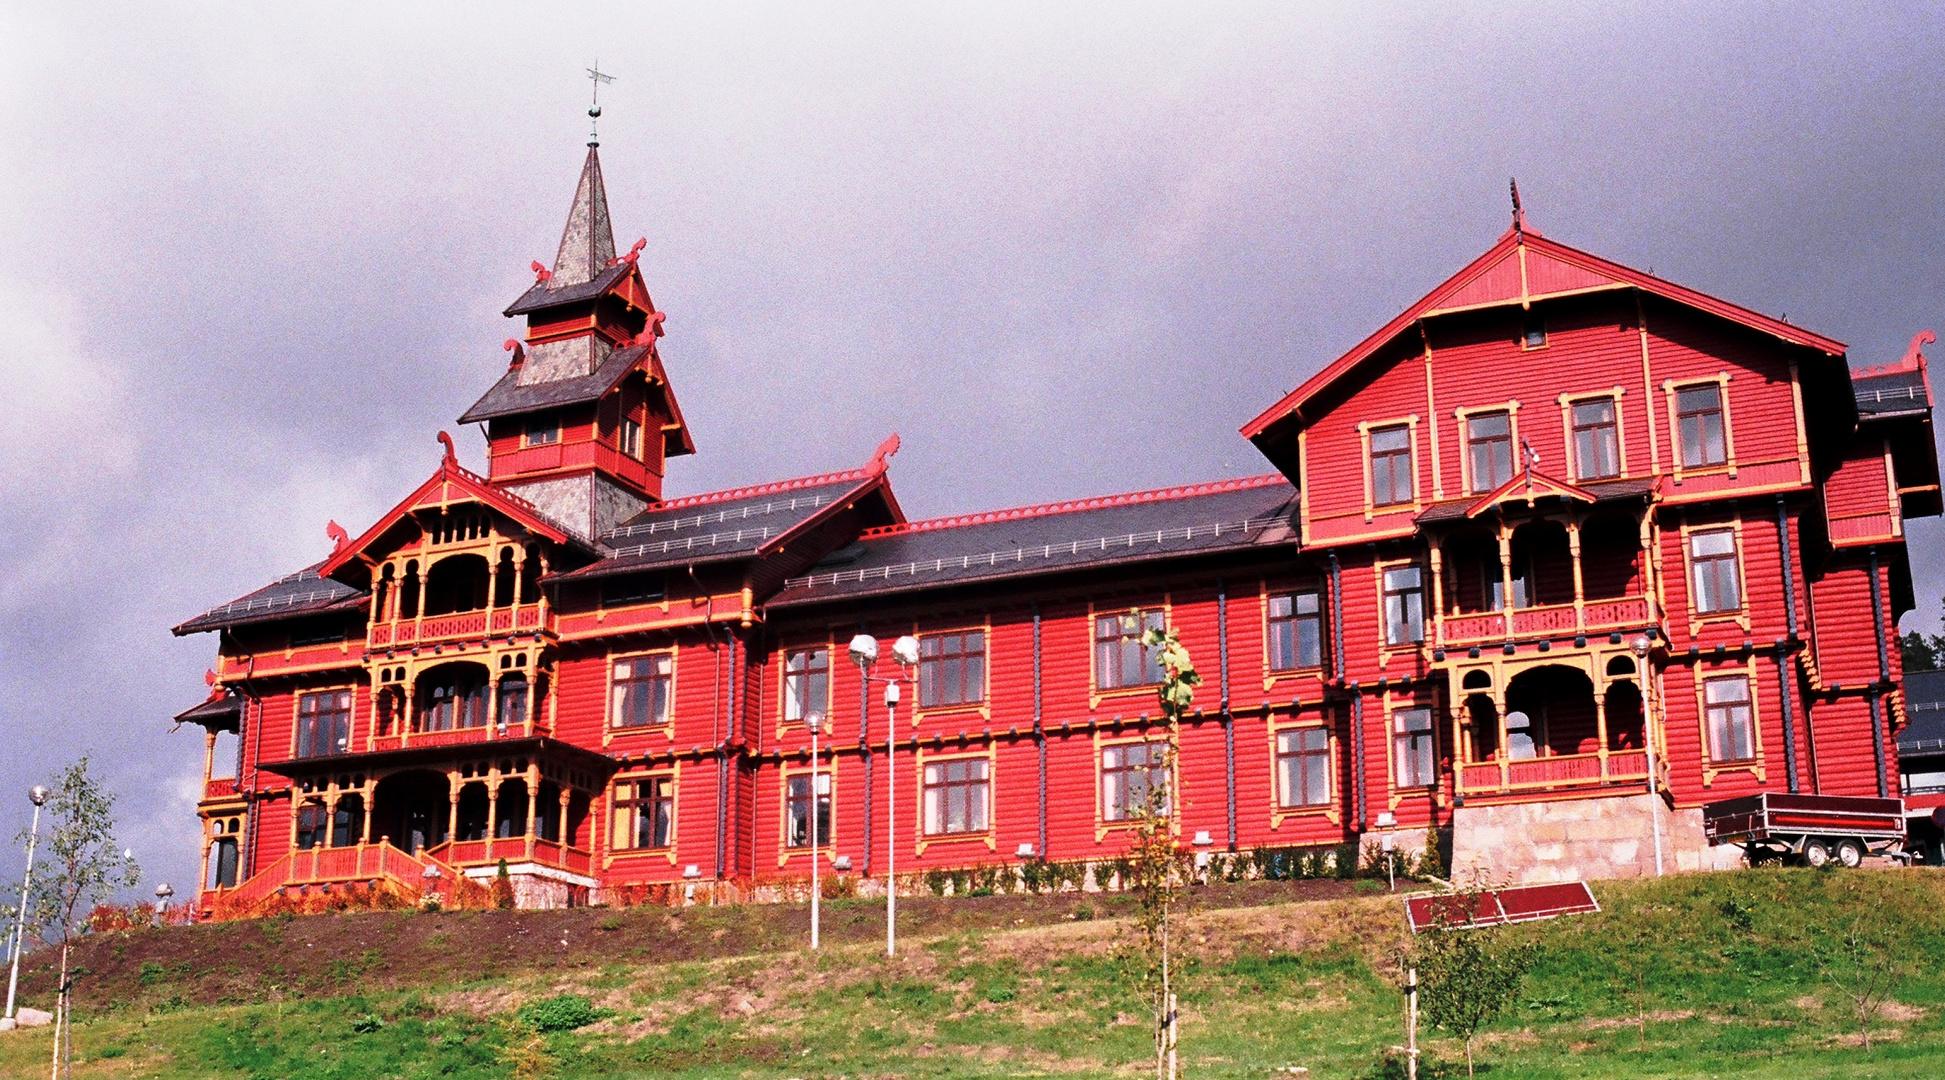 The Holmenkollen Park Hotel